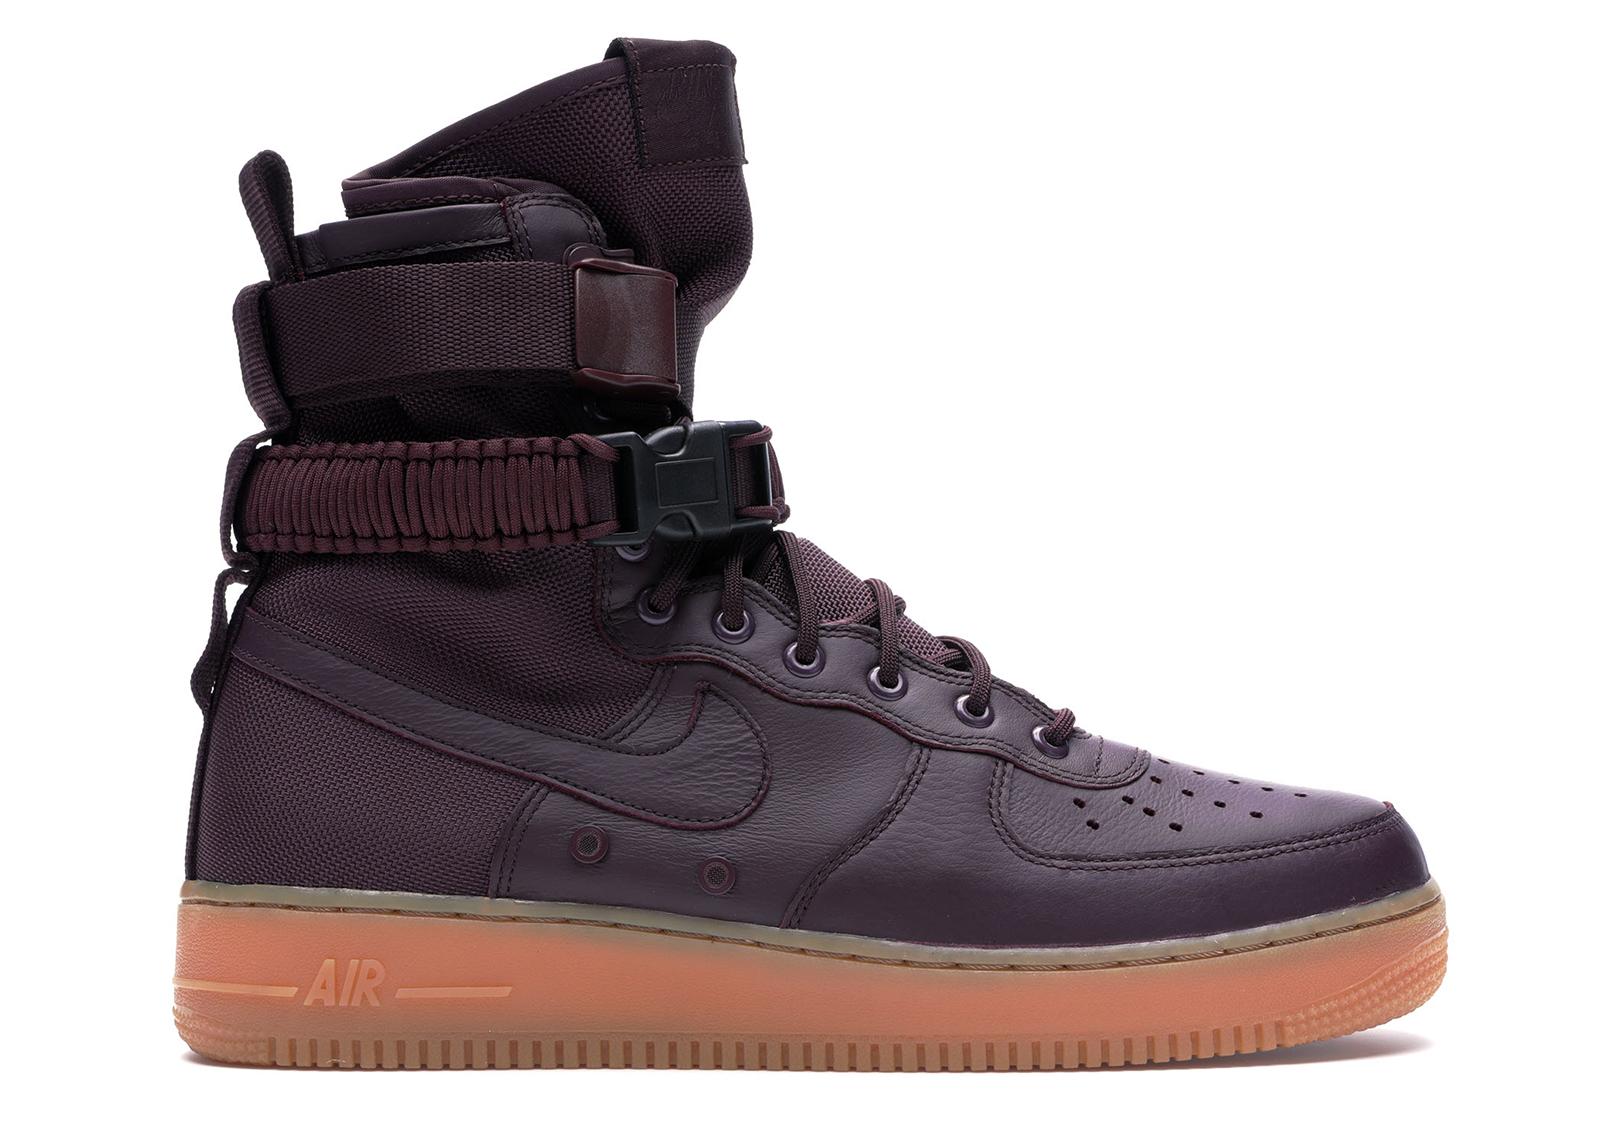 Nike SF Air Force 1 High Deep Burgundy